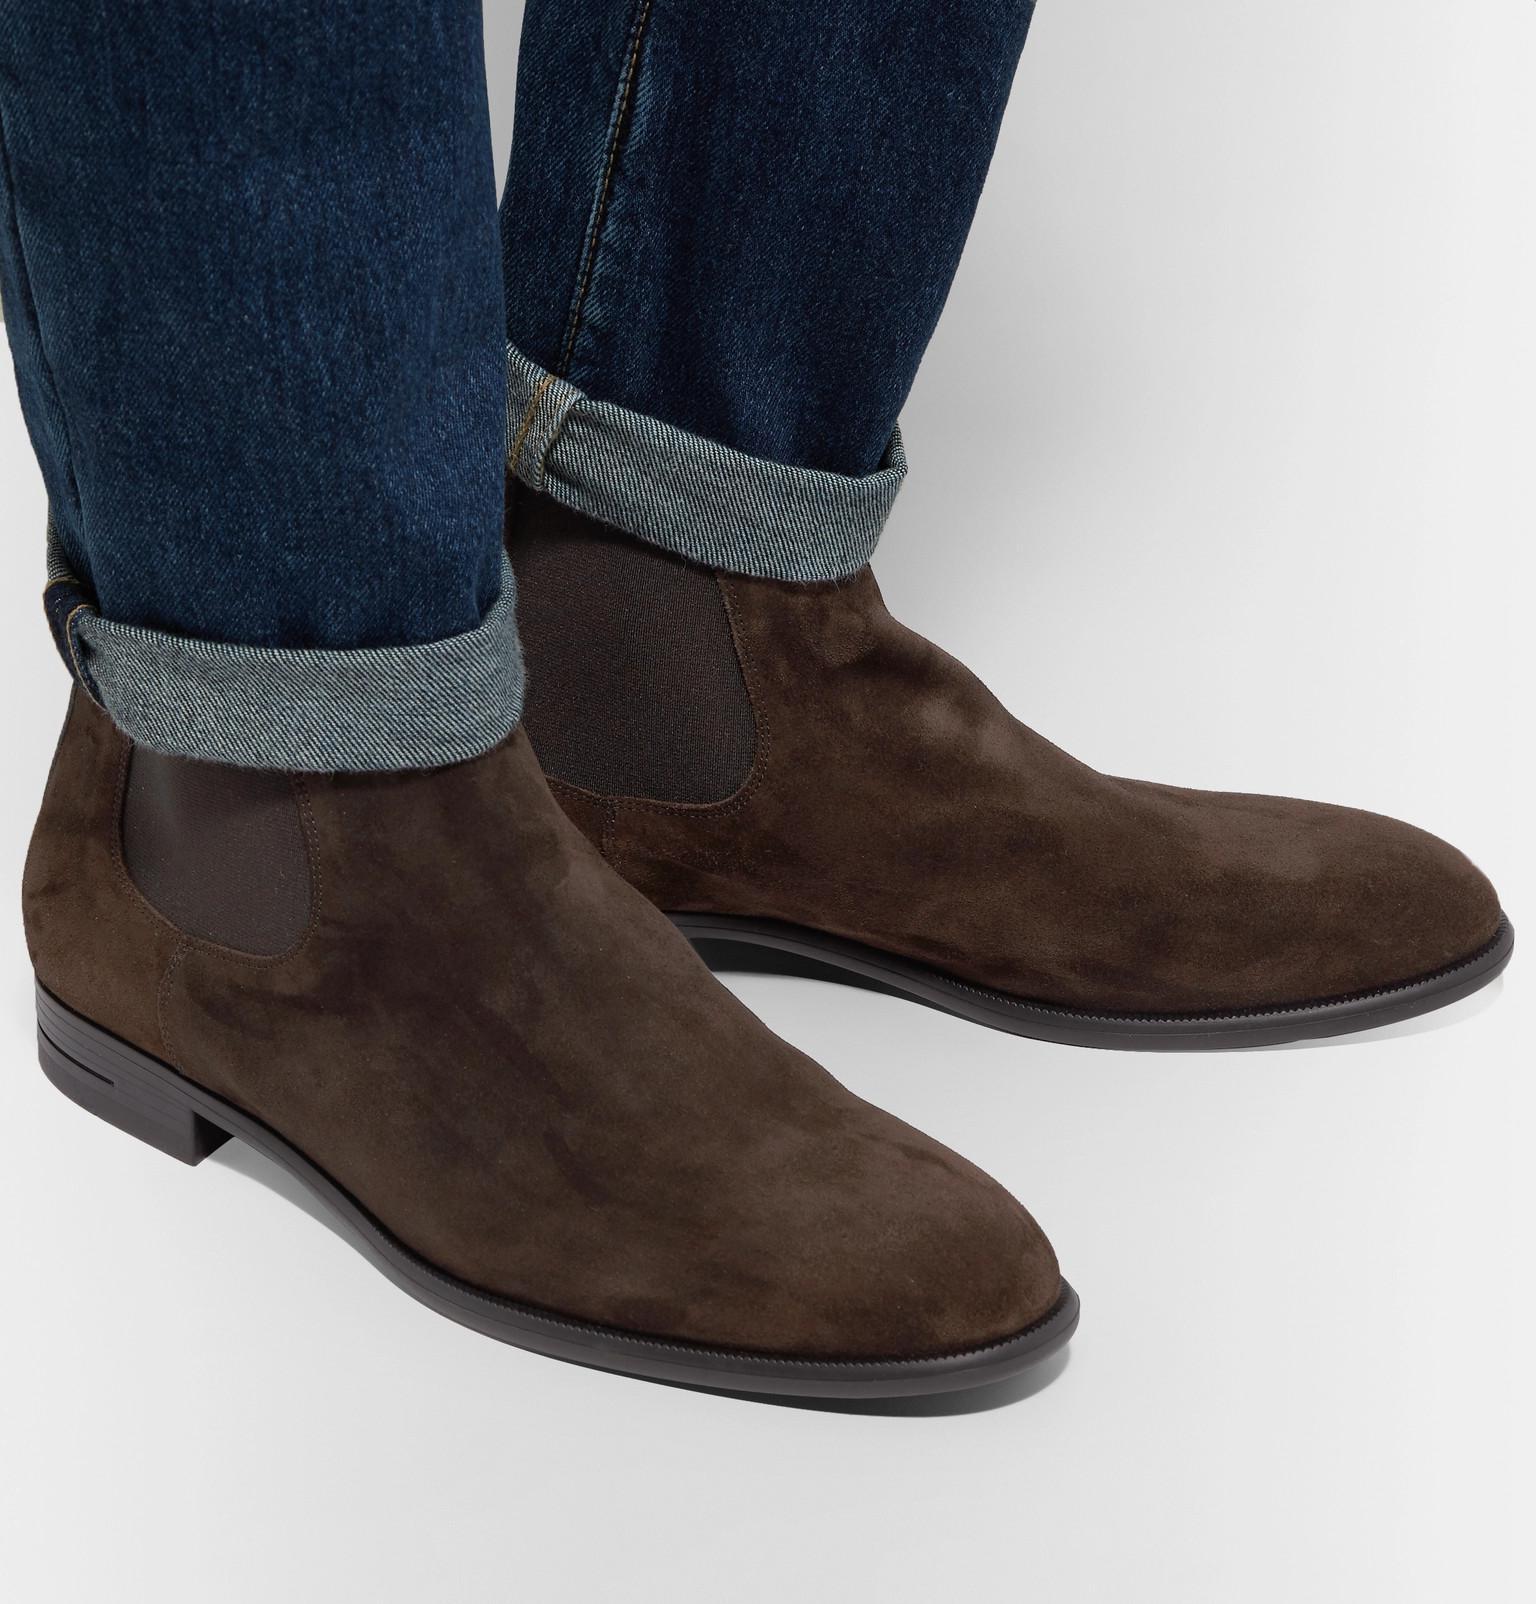 654cb839 Ermenegildo Zegna Brown Suede Chelsea Boots for men